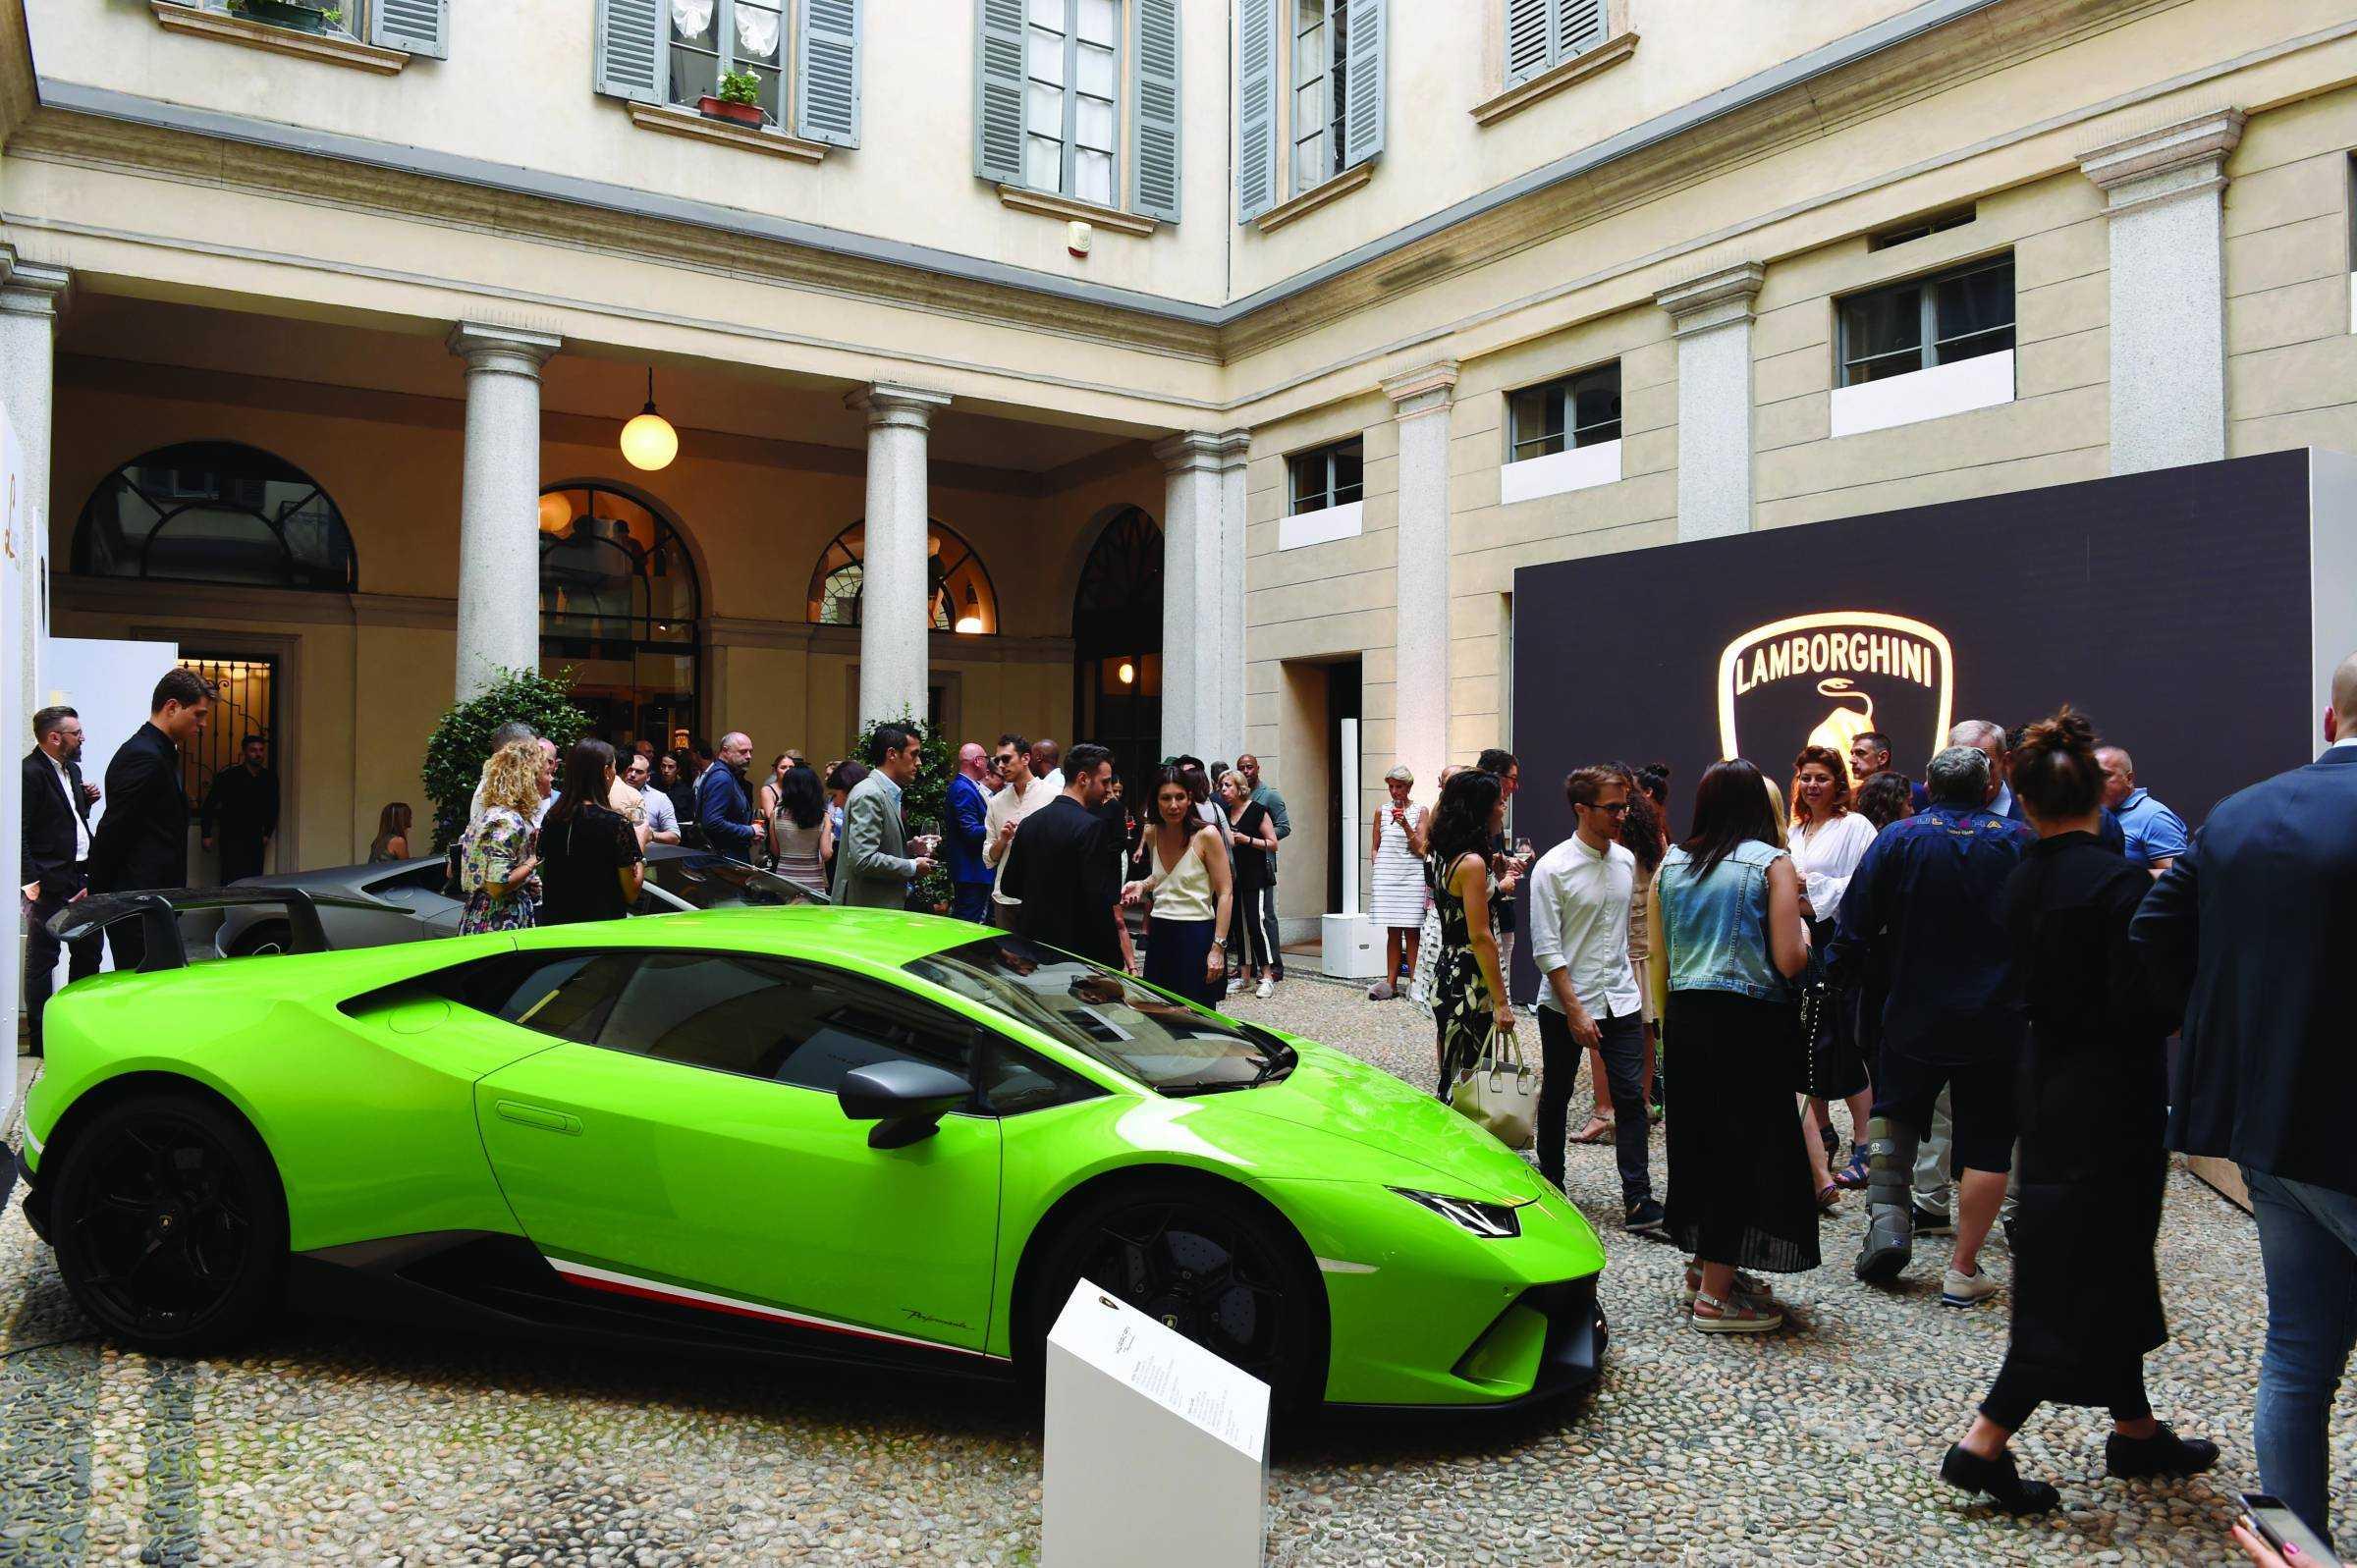 Lamborghini 2019 Spring Summer Collection